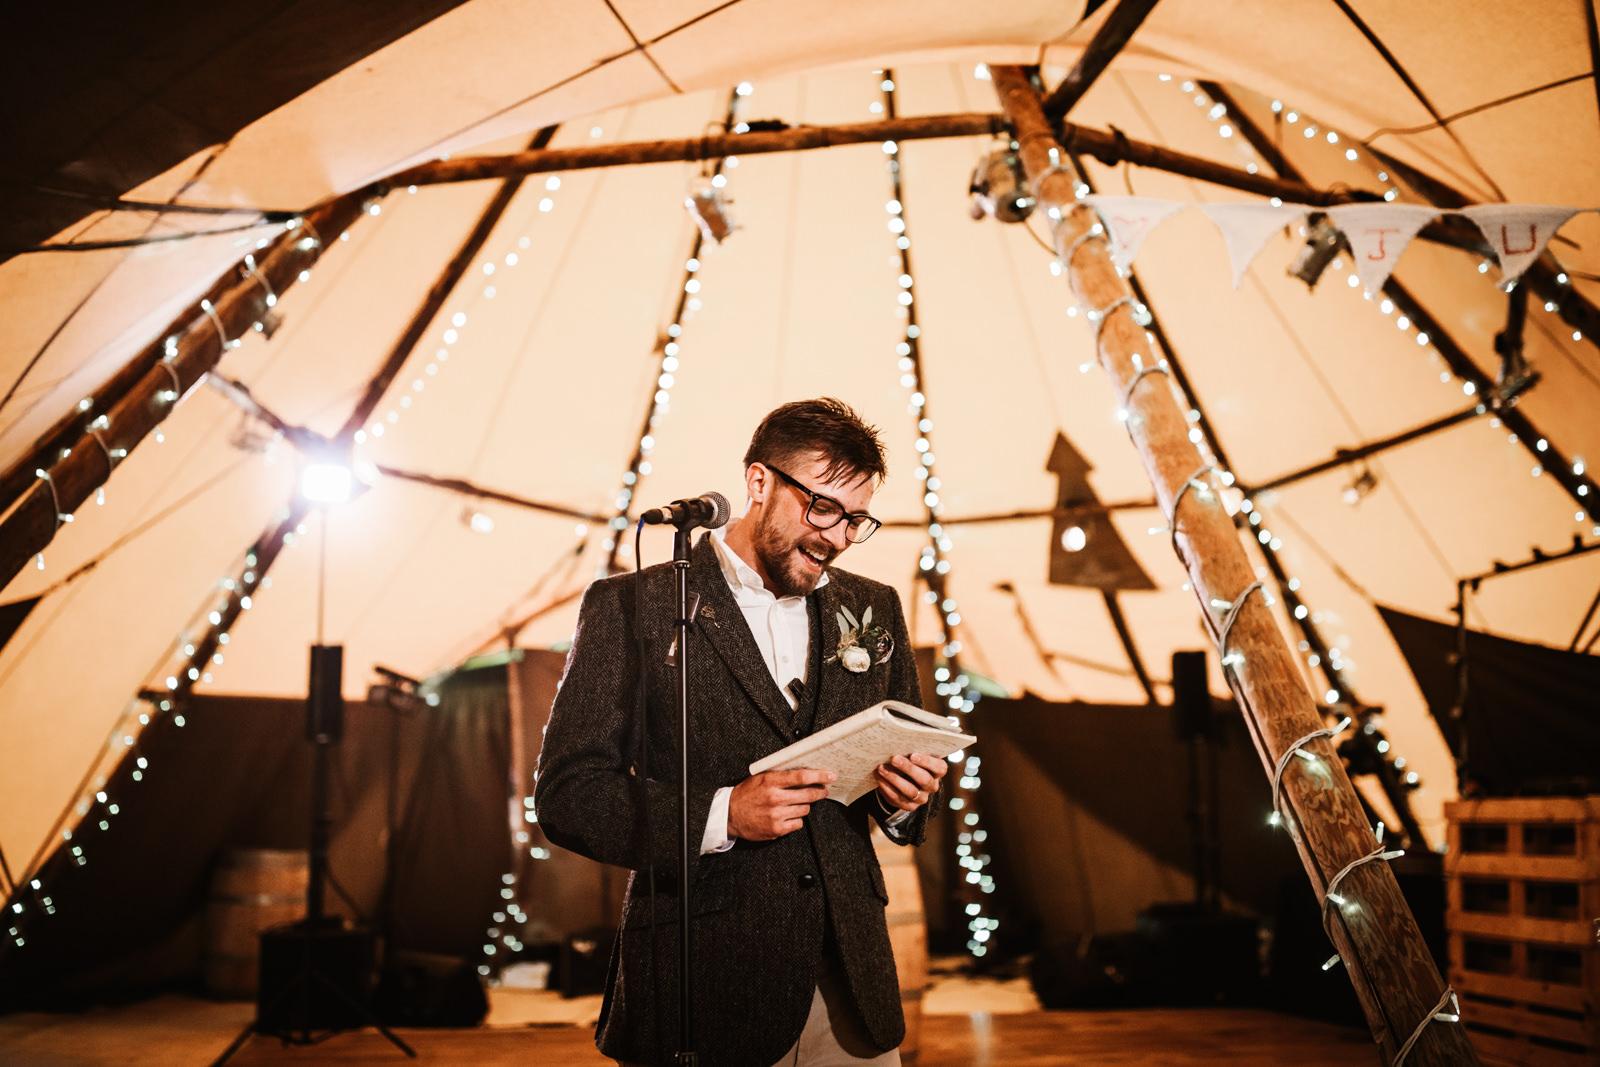 The groom speech